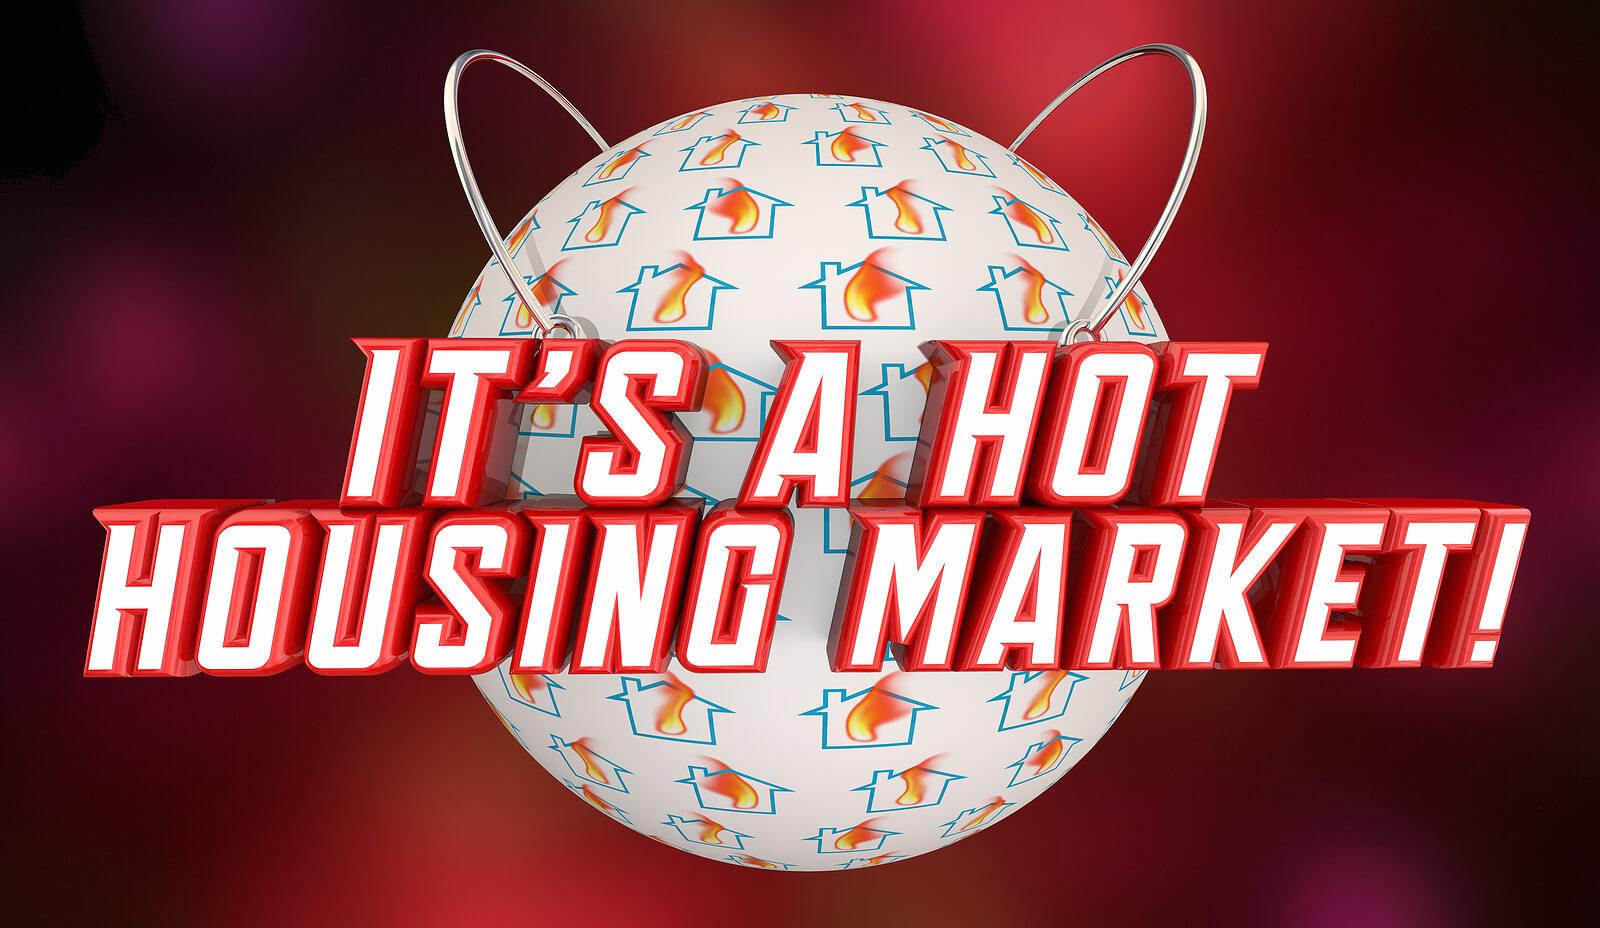 It's a hot housing Market